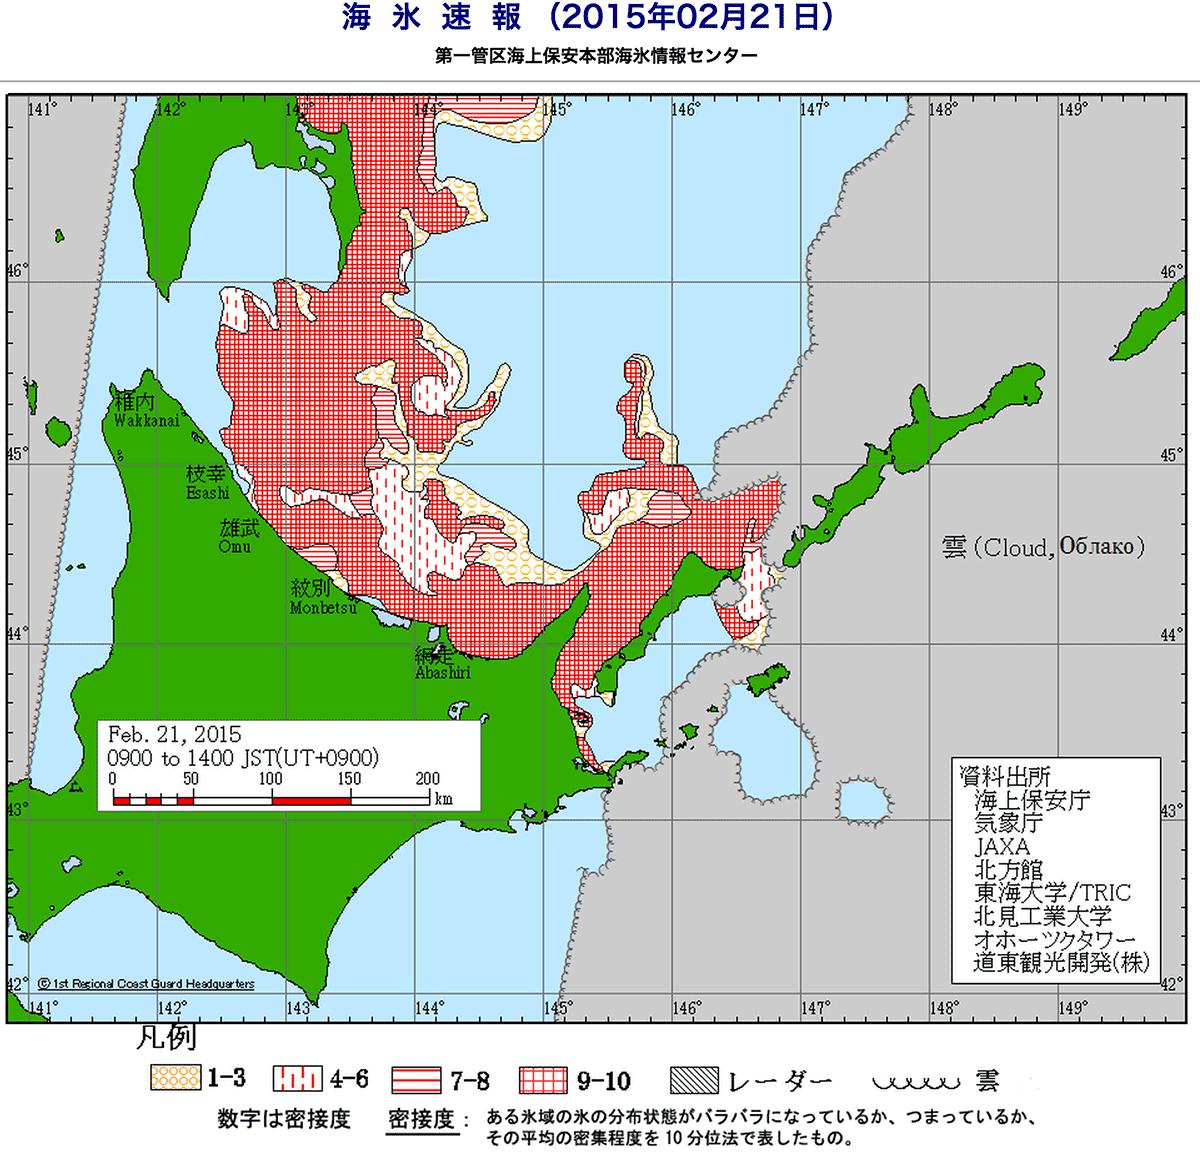 2015-02-28-10.30.02